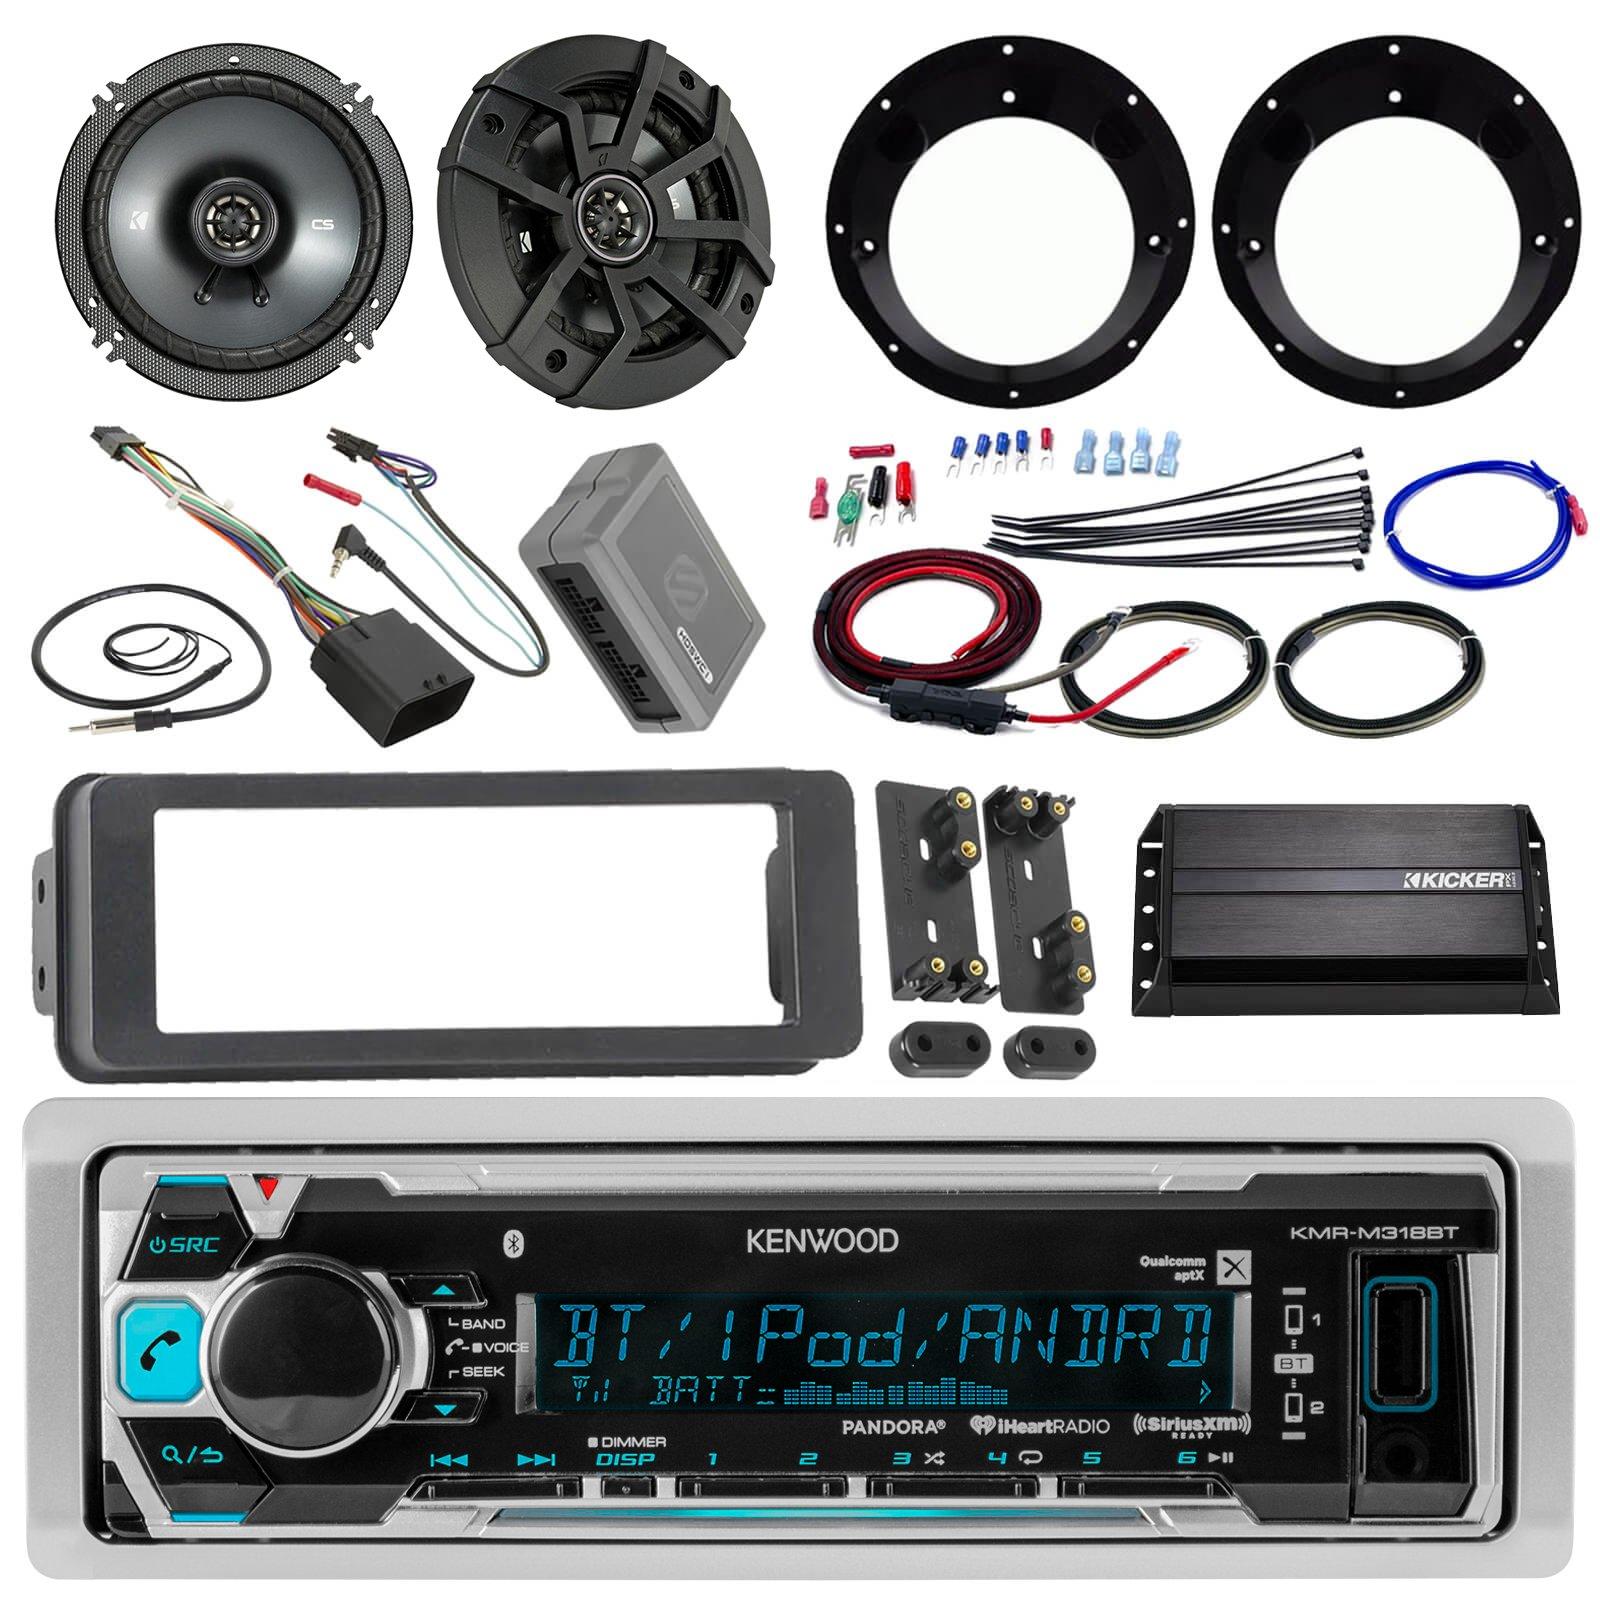 "Kenwood KMR-M315BT Stereo Receiver Bundle W/ 2 Kicker 6.5"" Speaker W/ Motorcycle Speaker Adapters + Class D Amplifier W/ Amp Kit + Dash Trim Kit W/ Handle Bar Conroller + Enrock Antenna"